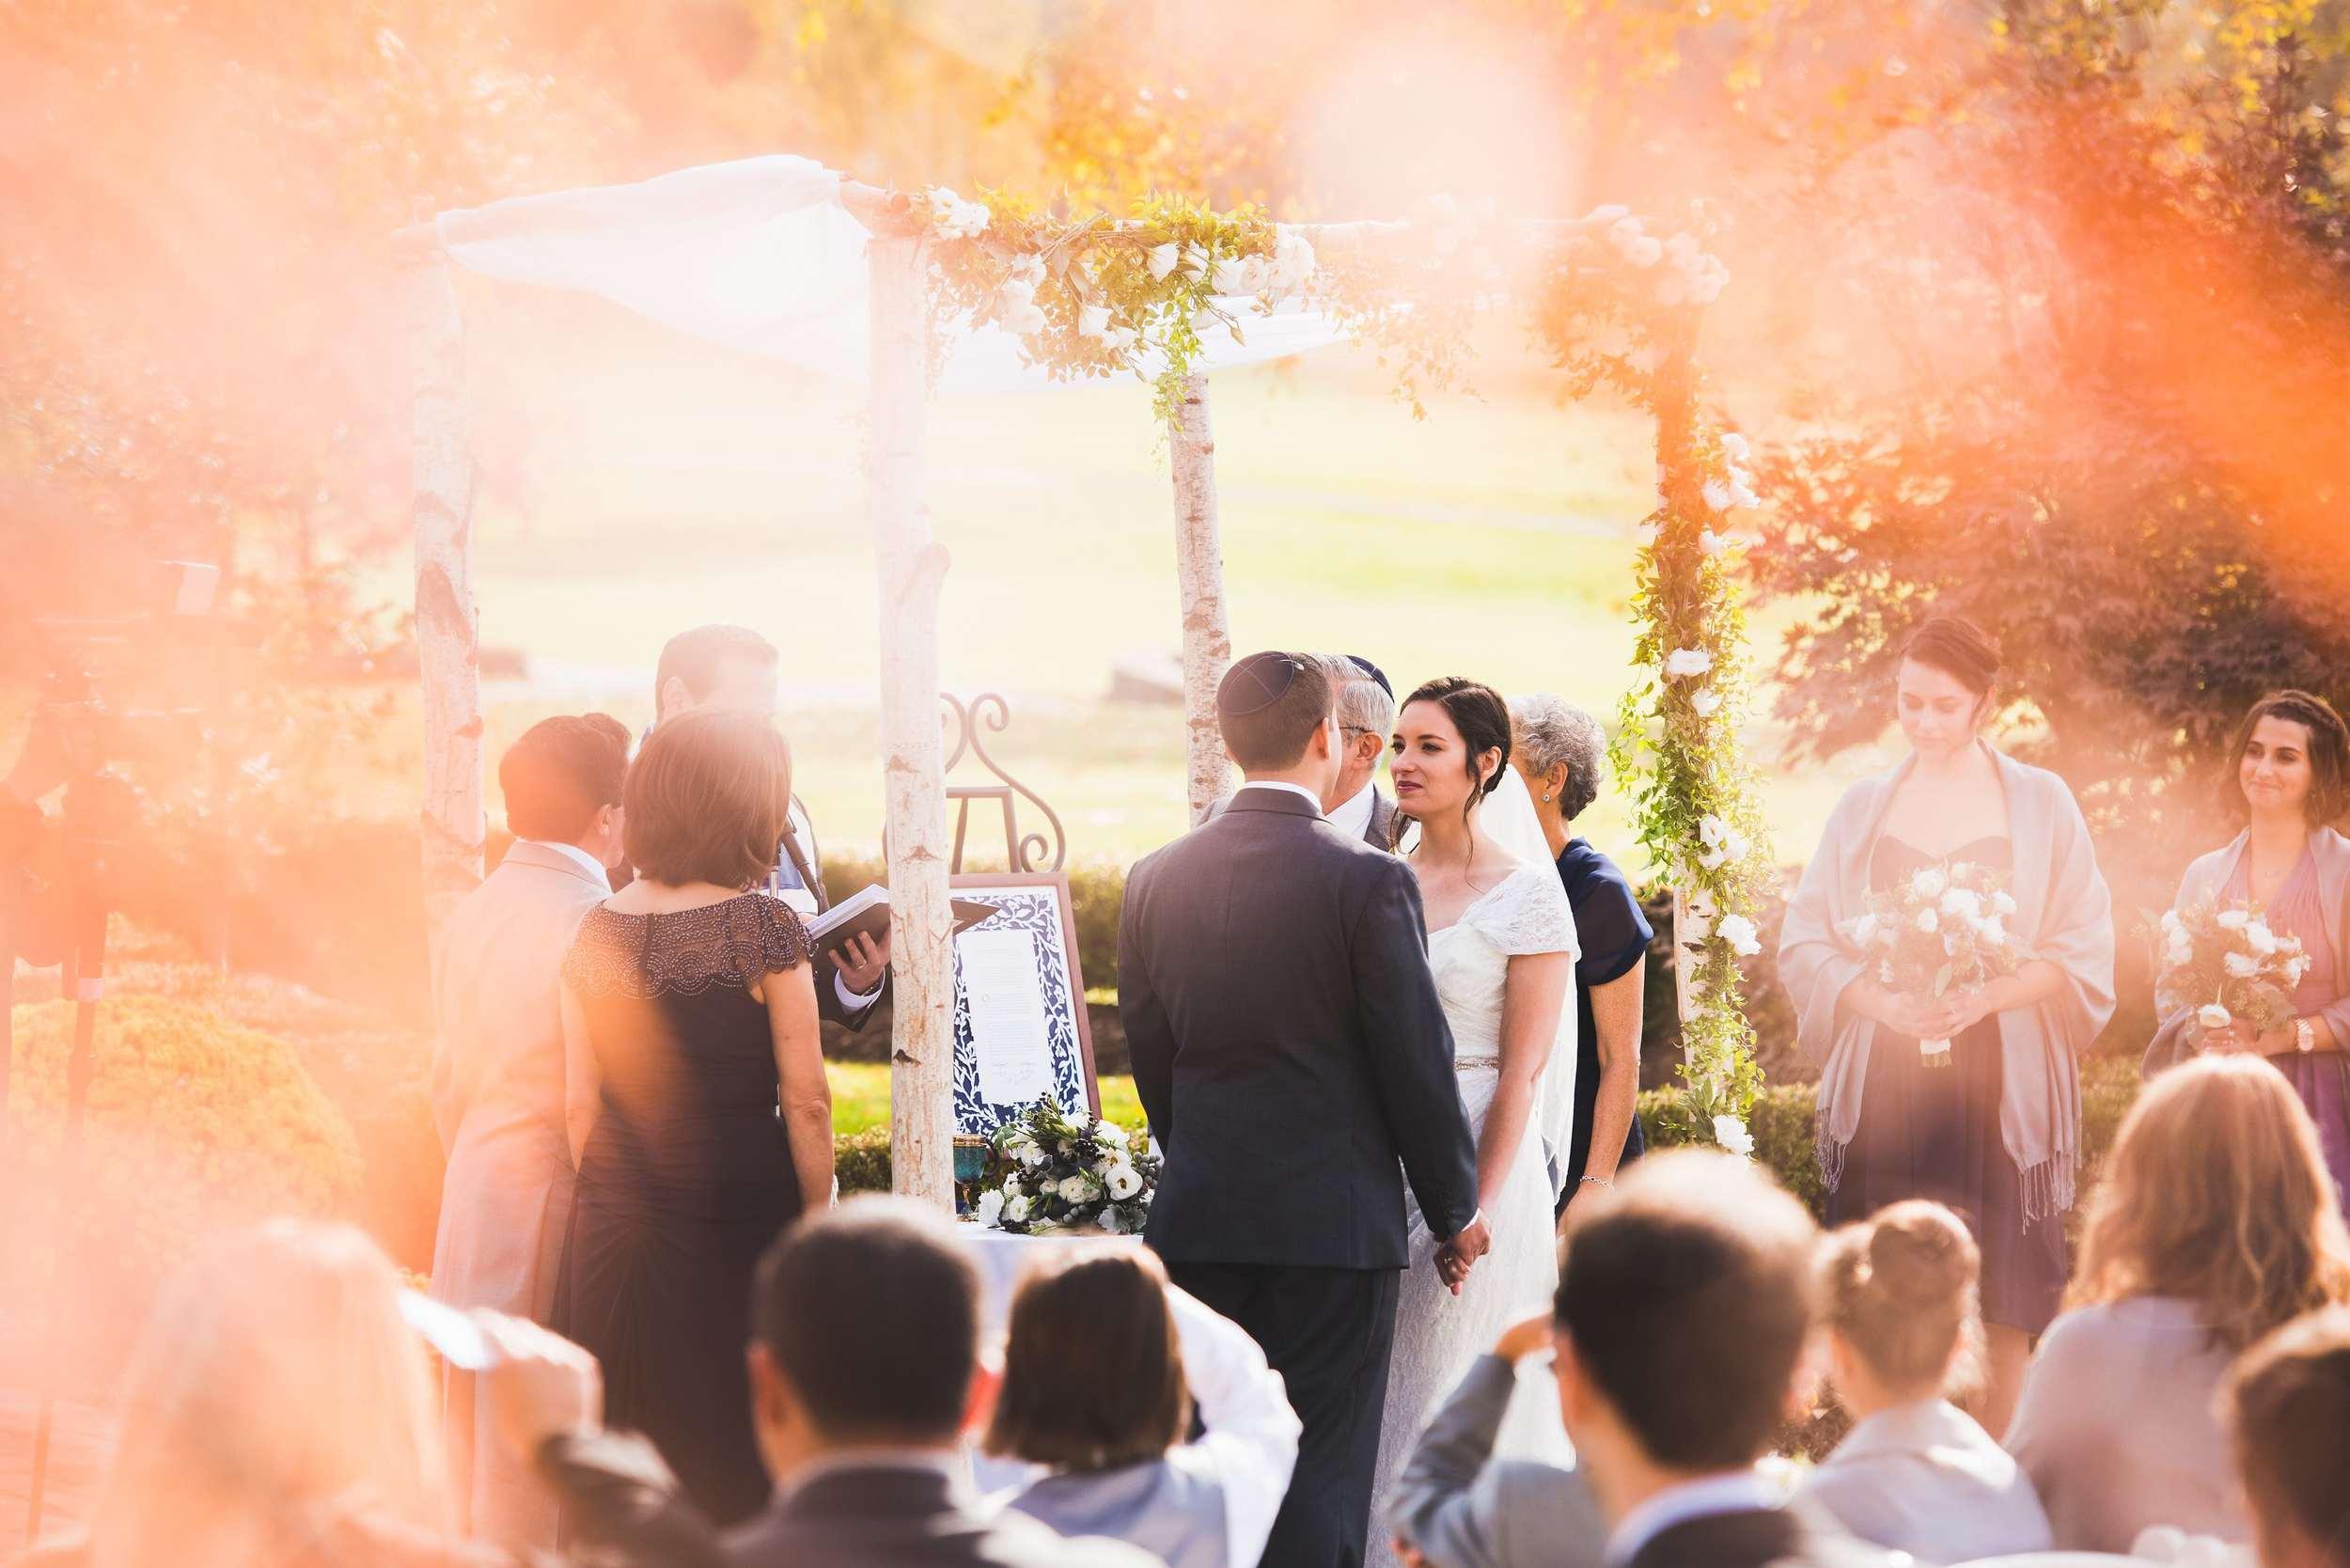 New-York-Wedding-Photographer-Falkirk-Wedding(115of163)-min.jpg